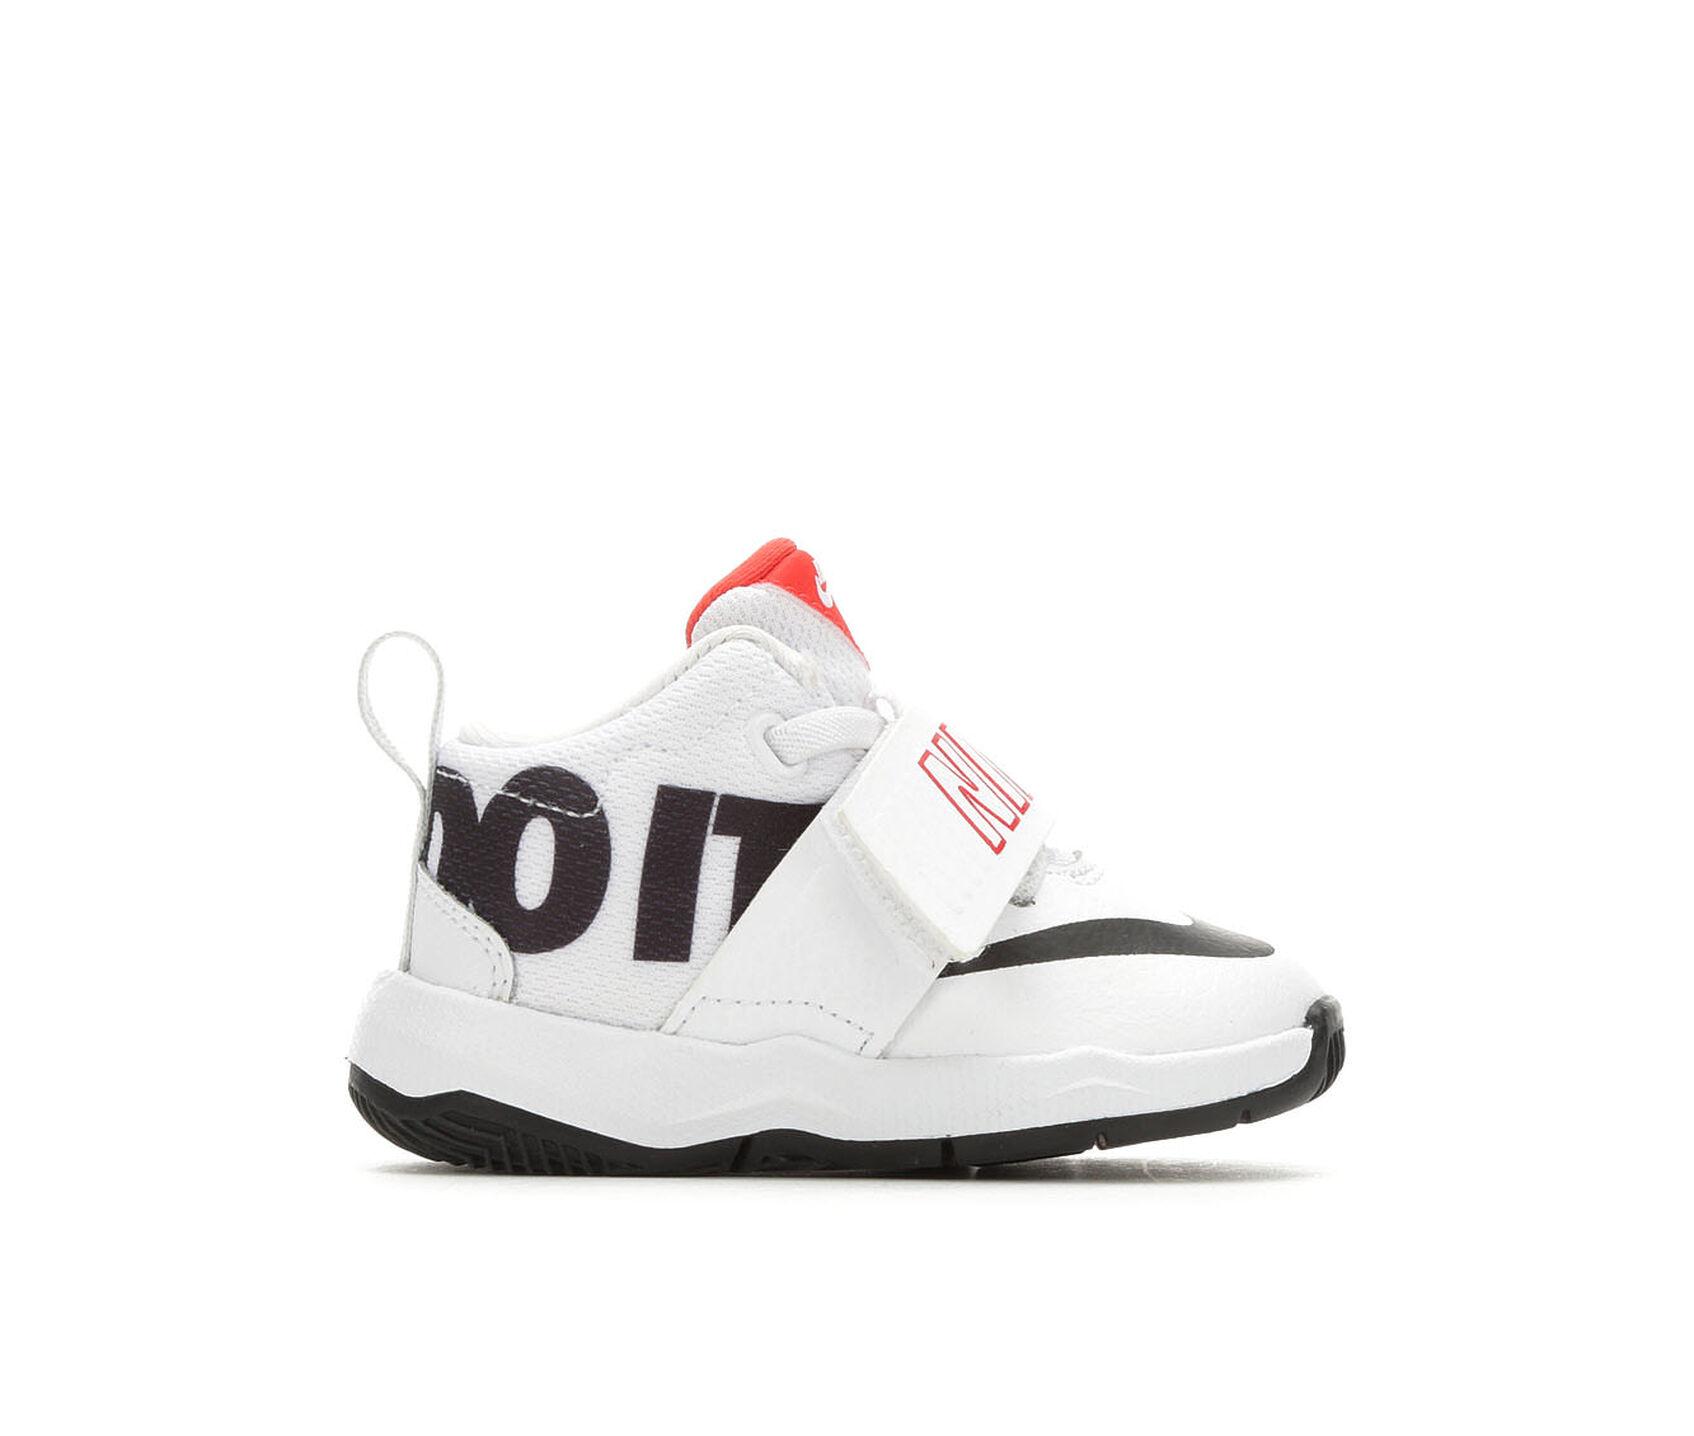 8ce2108d2ca Boys  Nike Infant   Toddler Team Hustle D8 JDI Basketball Shoes ...